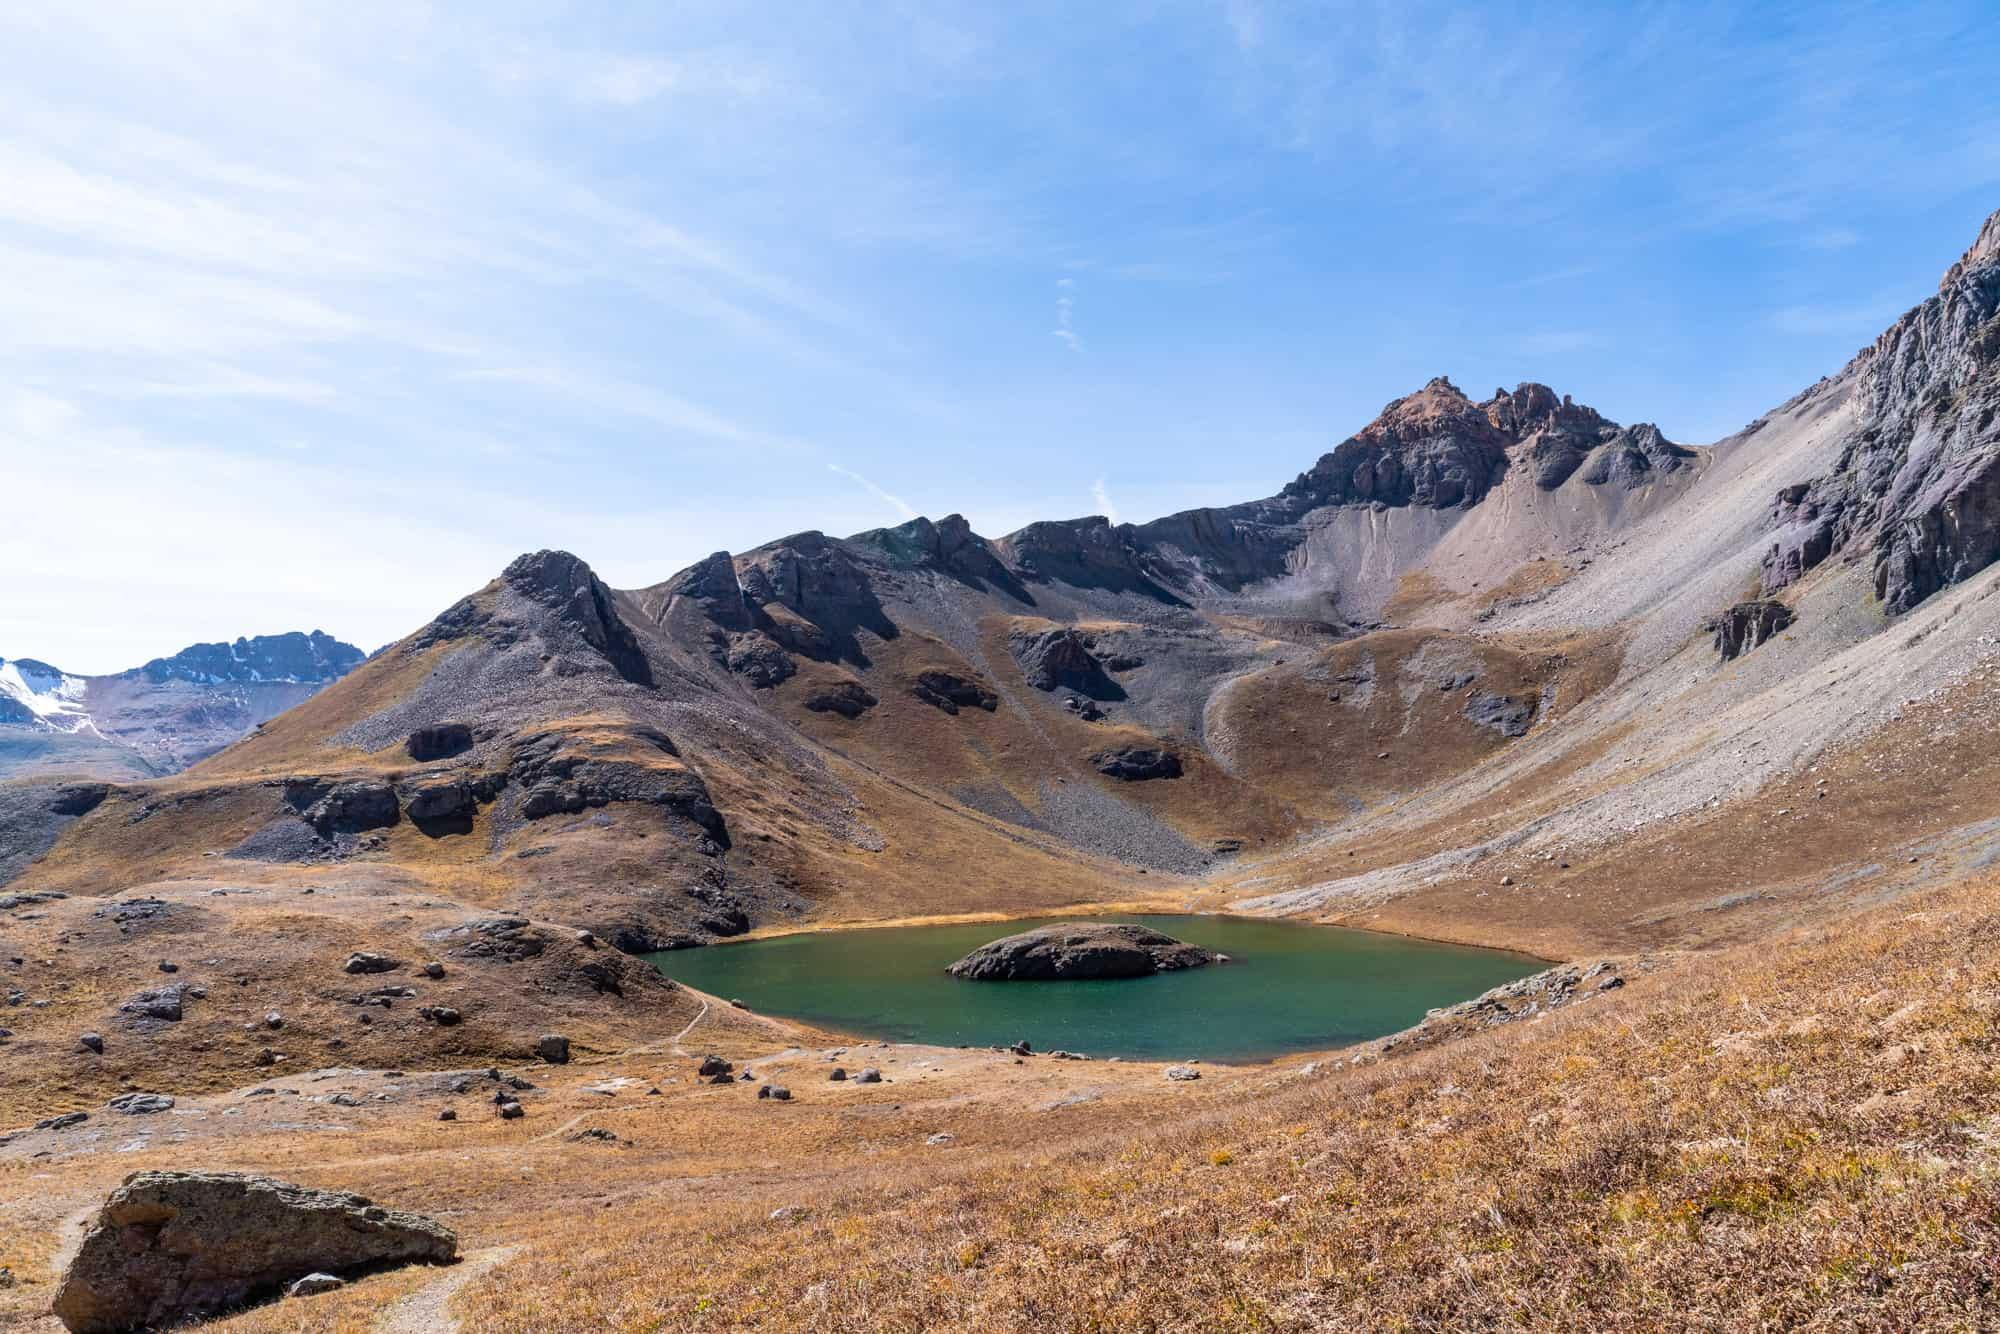 Island Lake Colorado Road Trip